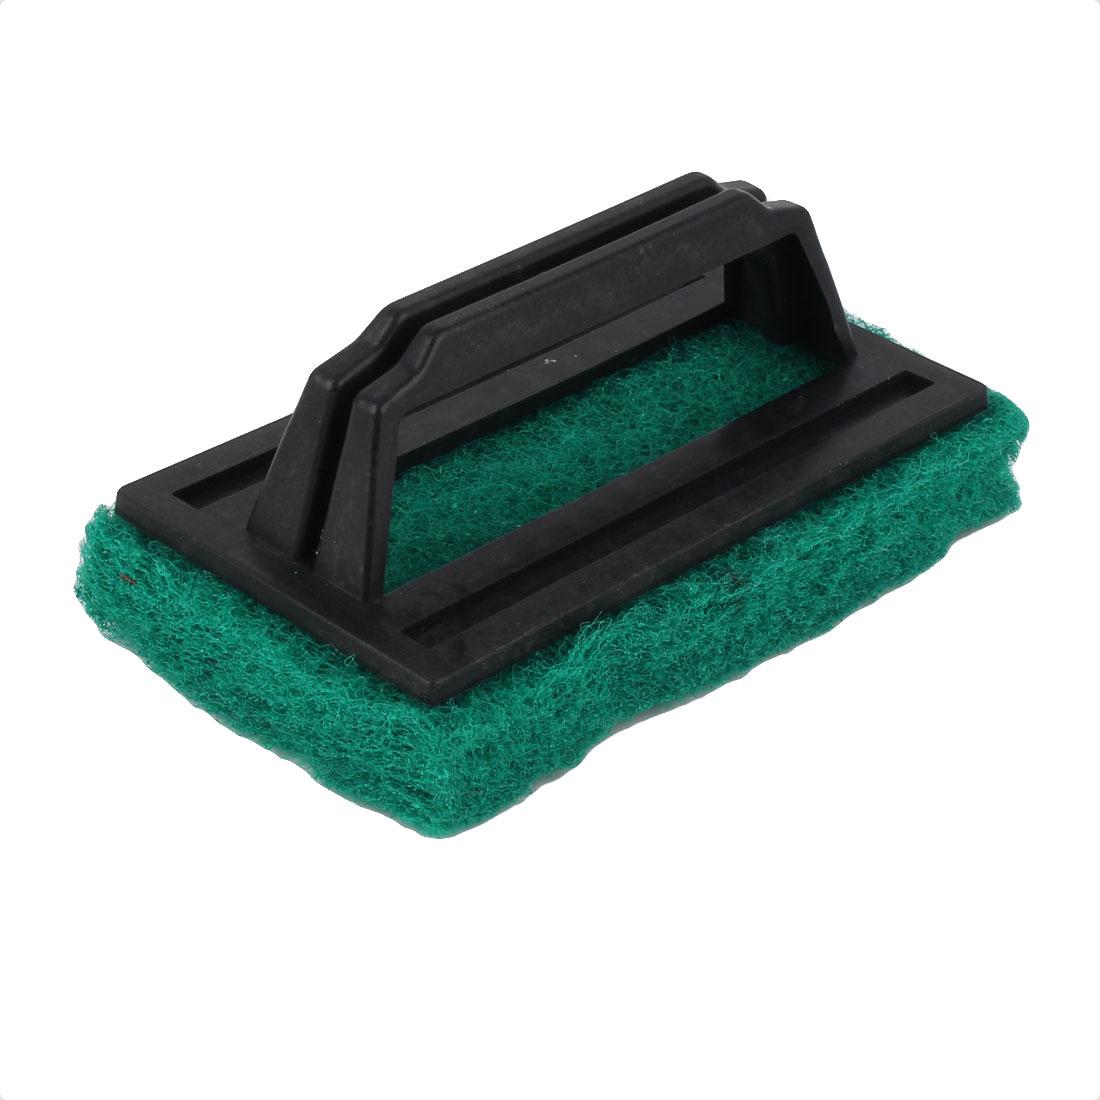 Household Kitchen Plastic Handle Sponge Bathtub Cleaning Brush Green Black